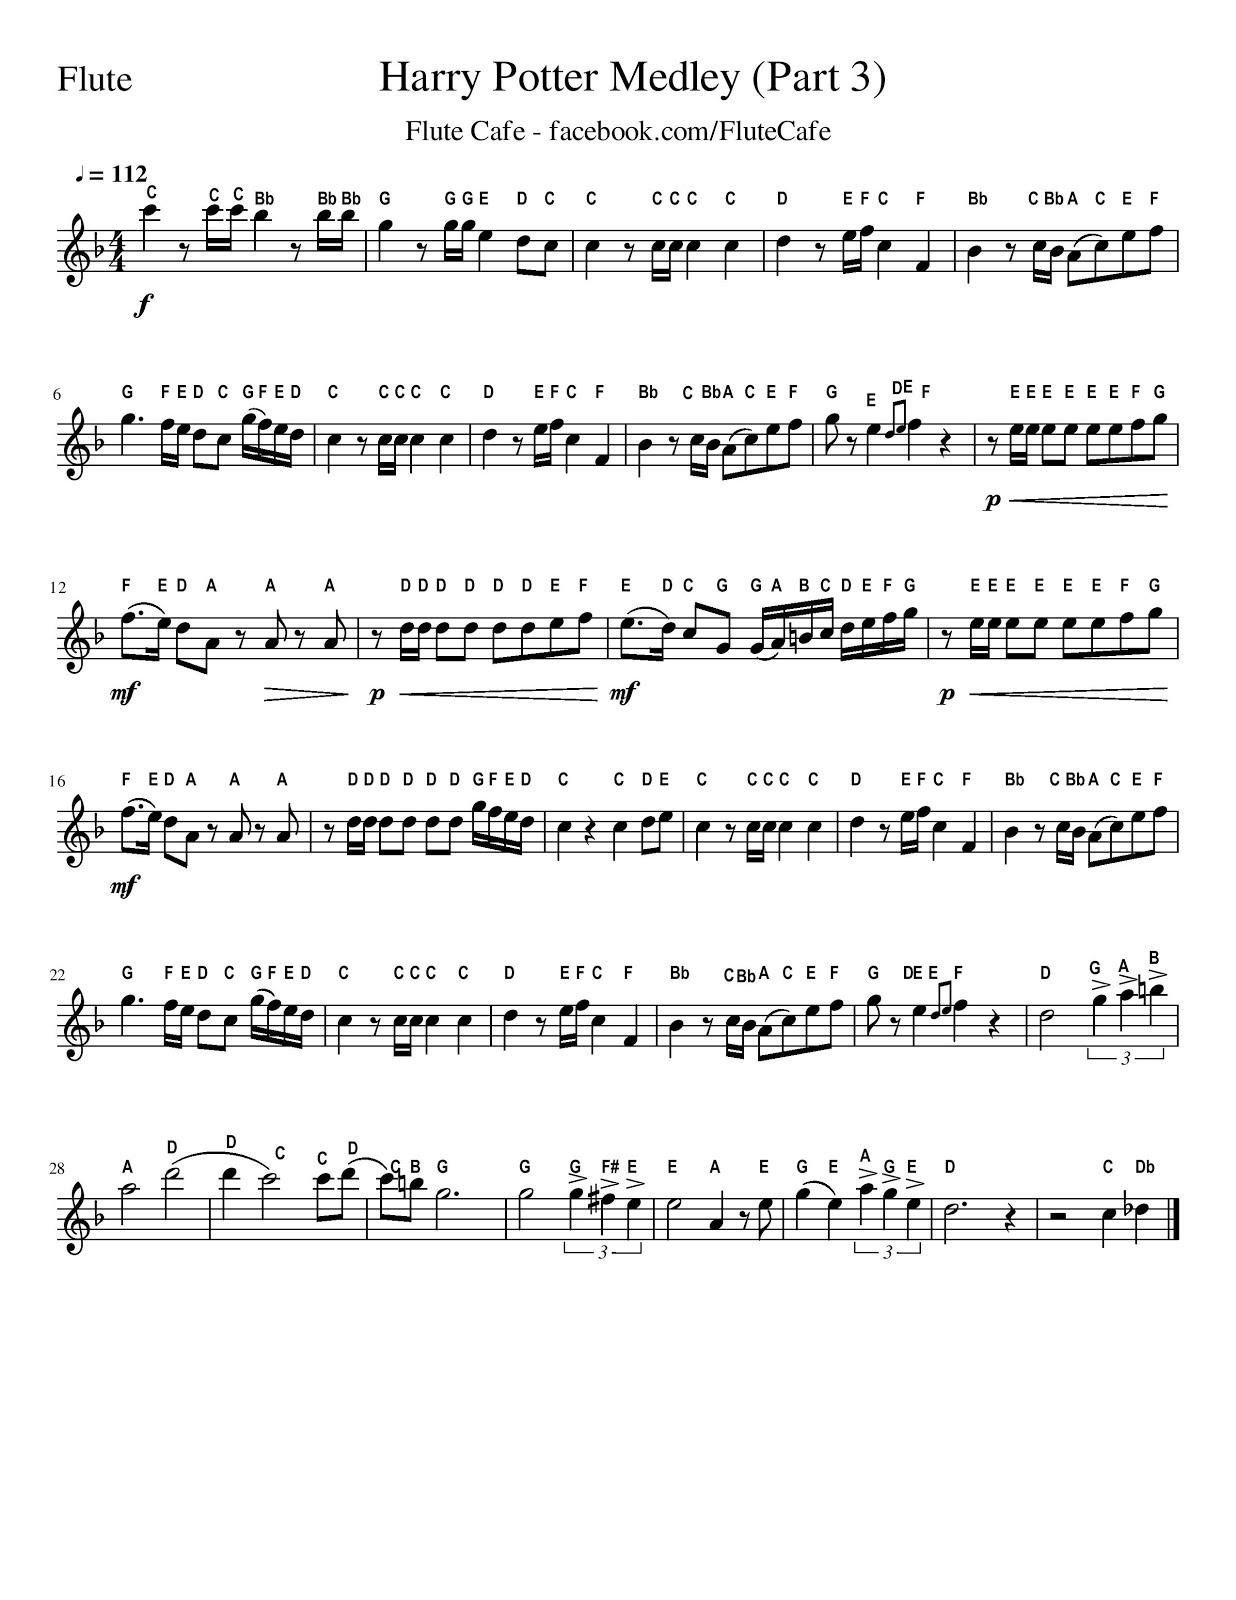 Flute Cafe: Harry Potter Medley (Flute Sheet Music) - Free Printable Flute Sheet Music For Pop Songs